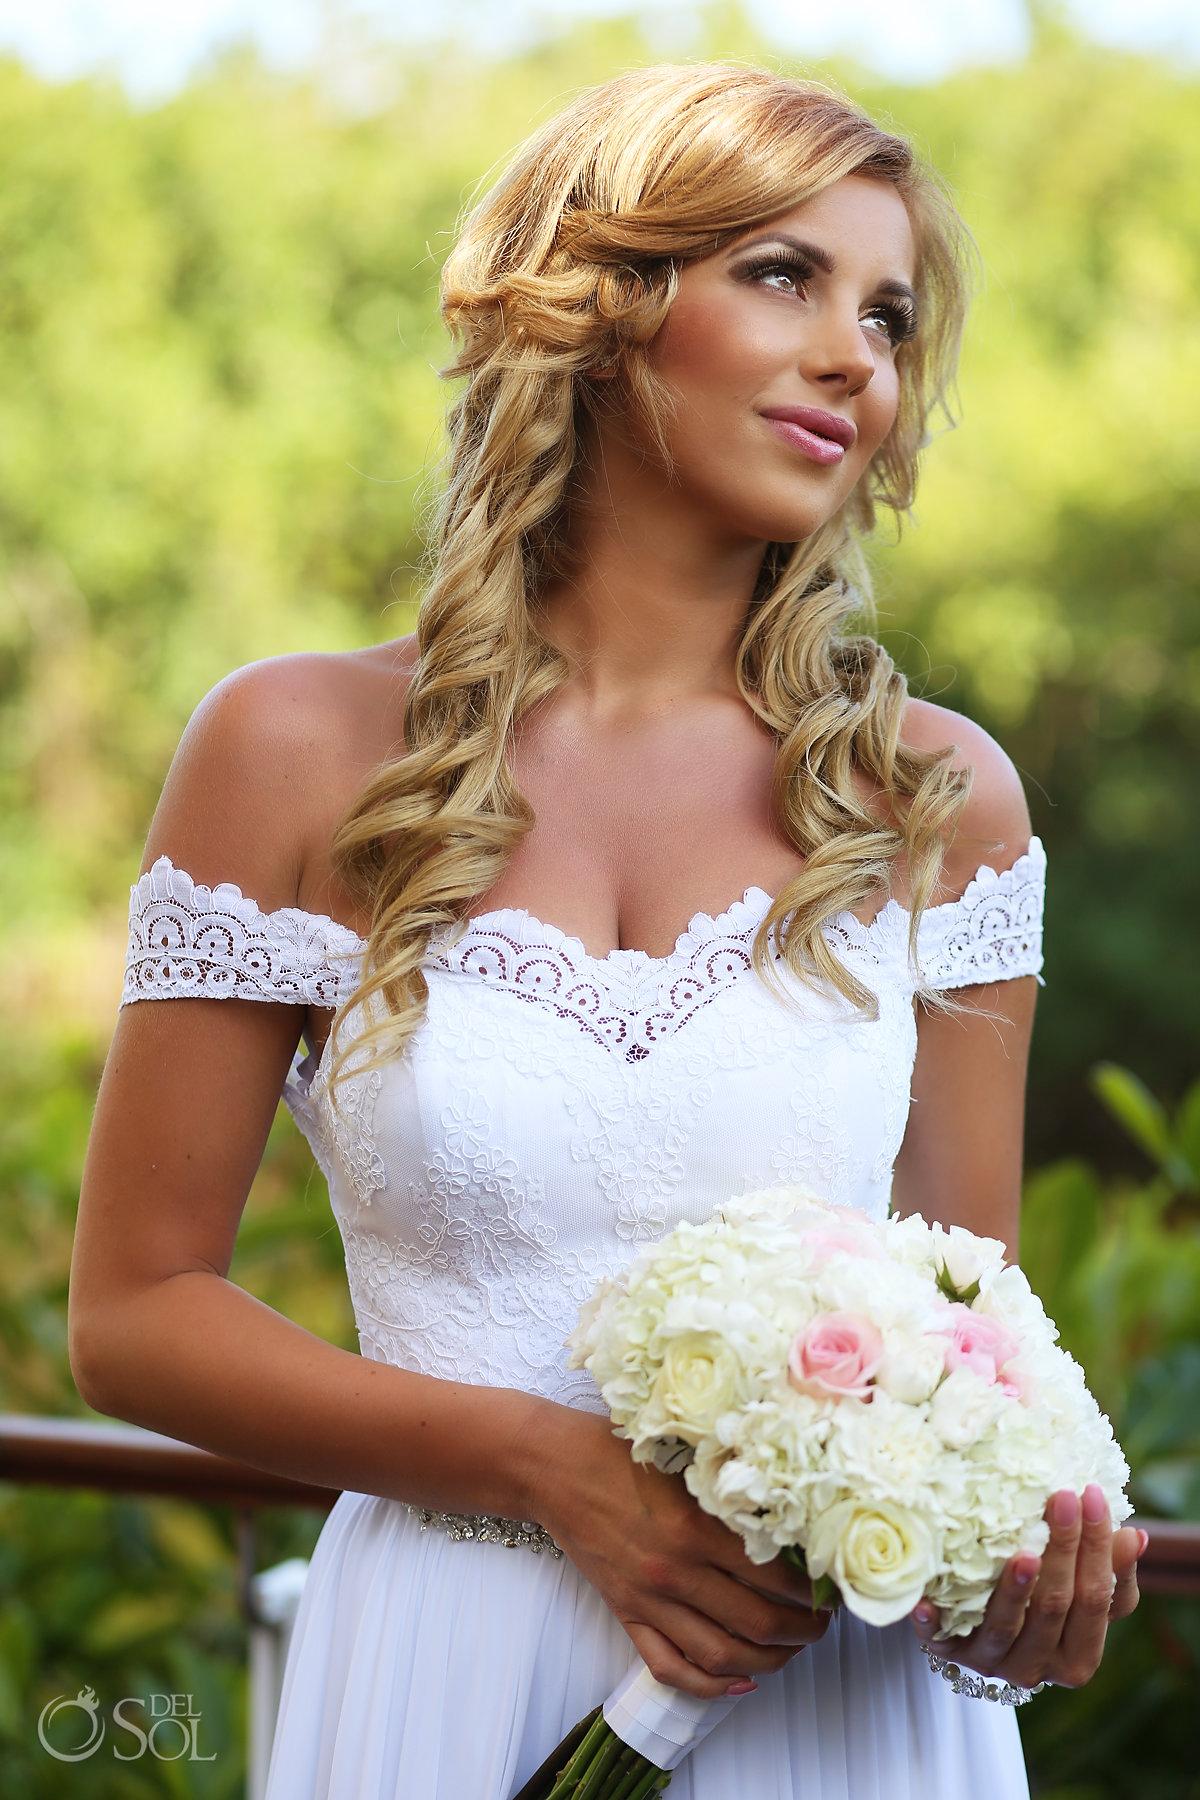 Bride Portrait Bridal Hairstyles for Long Hair best elopement locations Mexico Blue Diamond Luxury Boutique Hotel